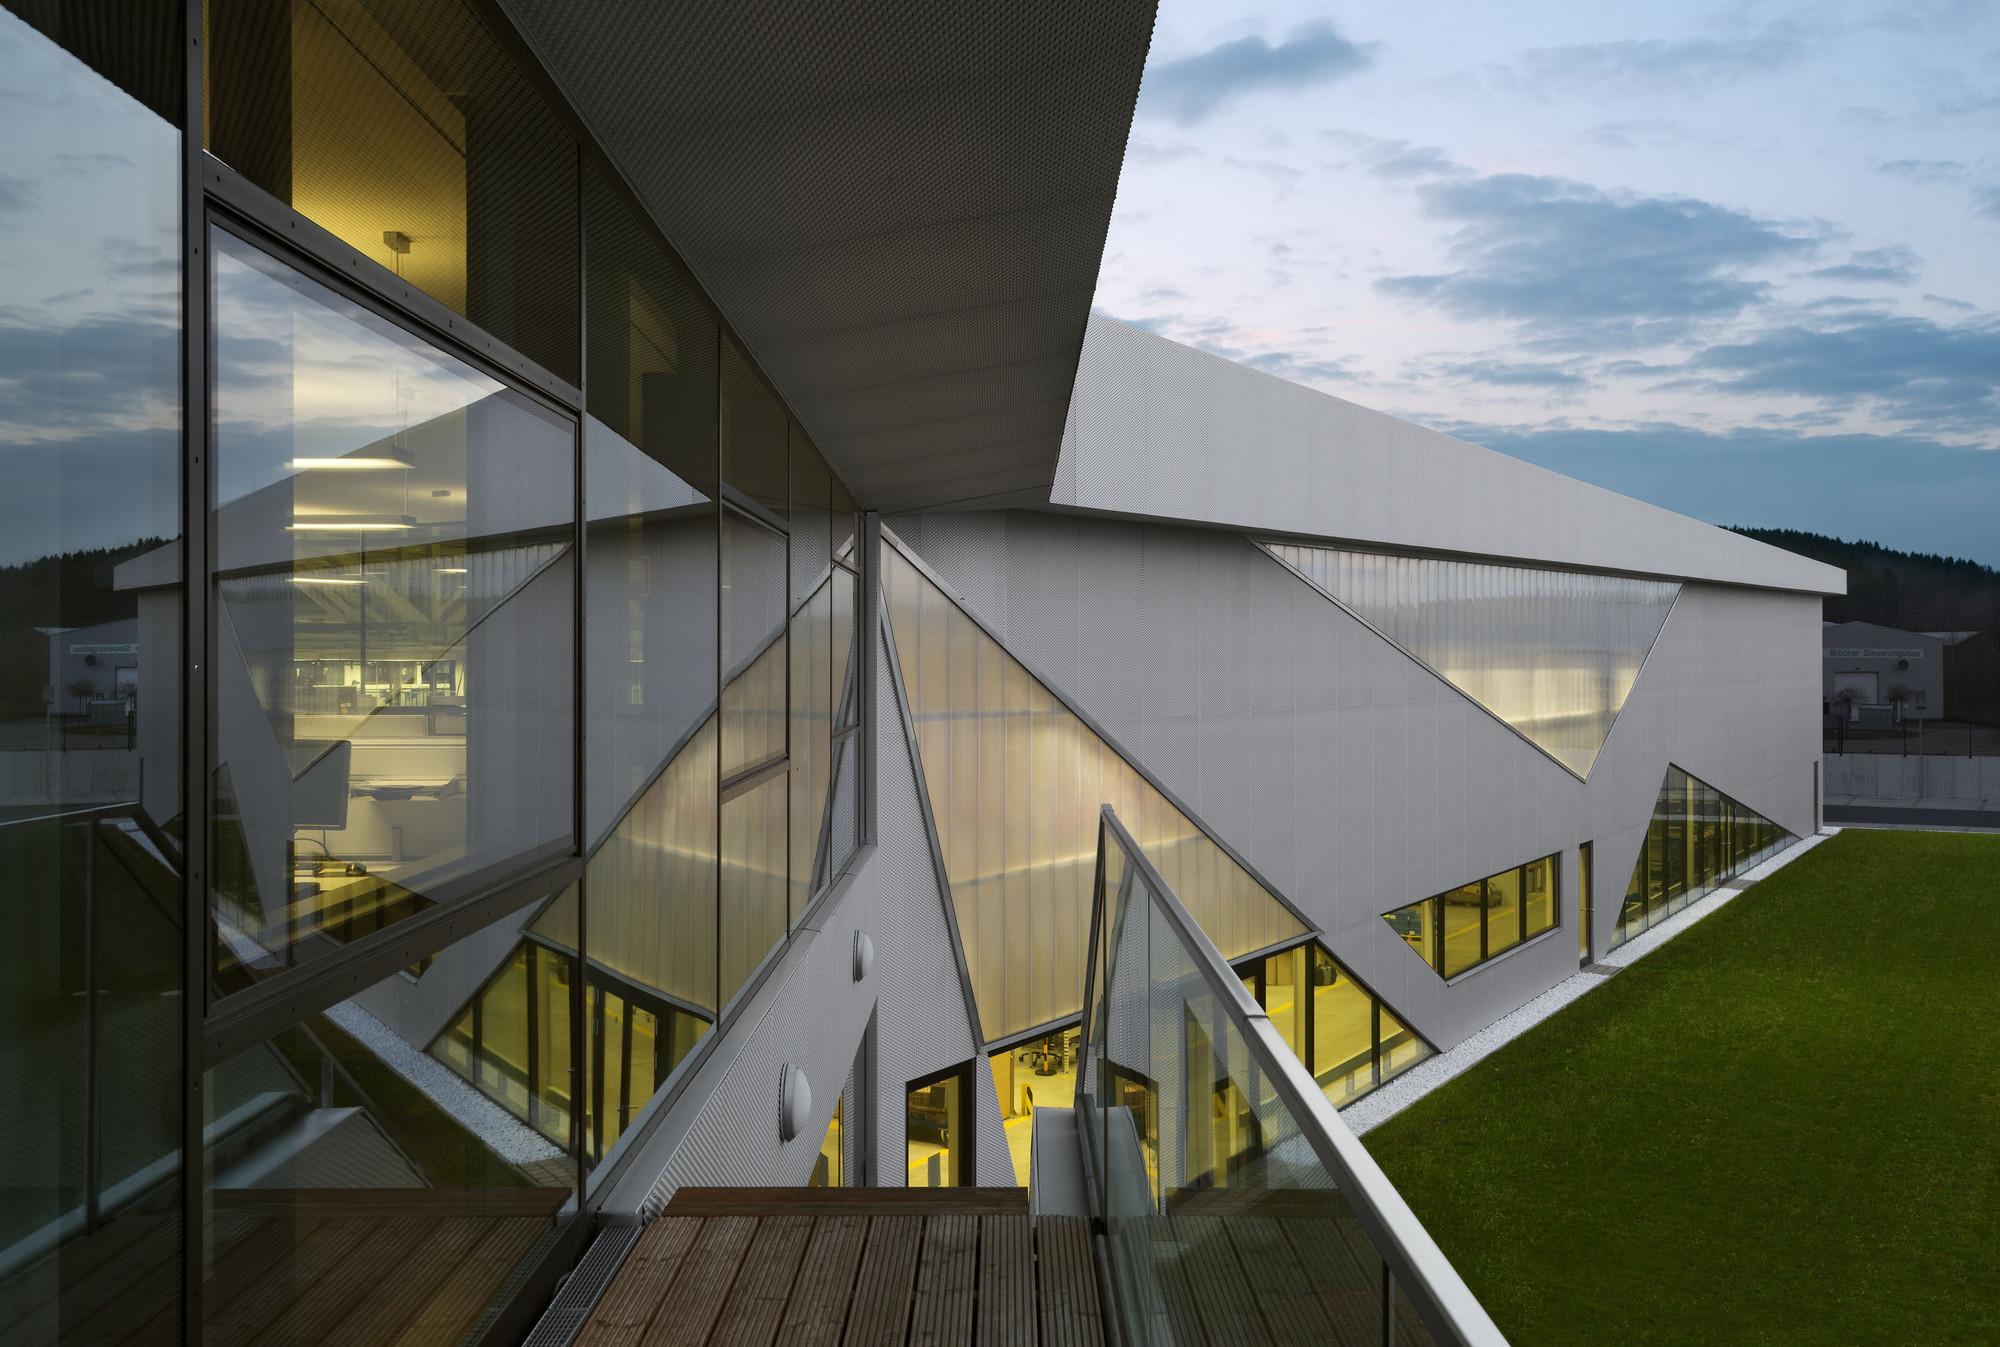 New building Drehmo Wenden / wurm + wurm, © Ester Havlova, Walter Fogel